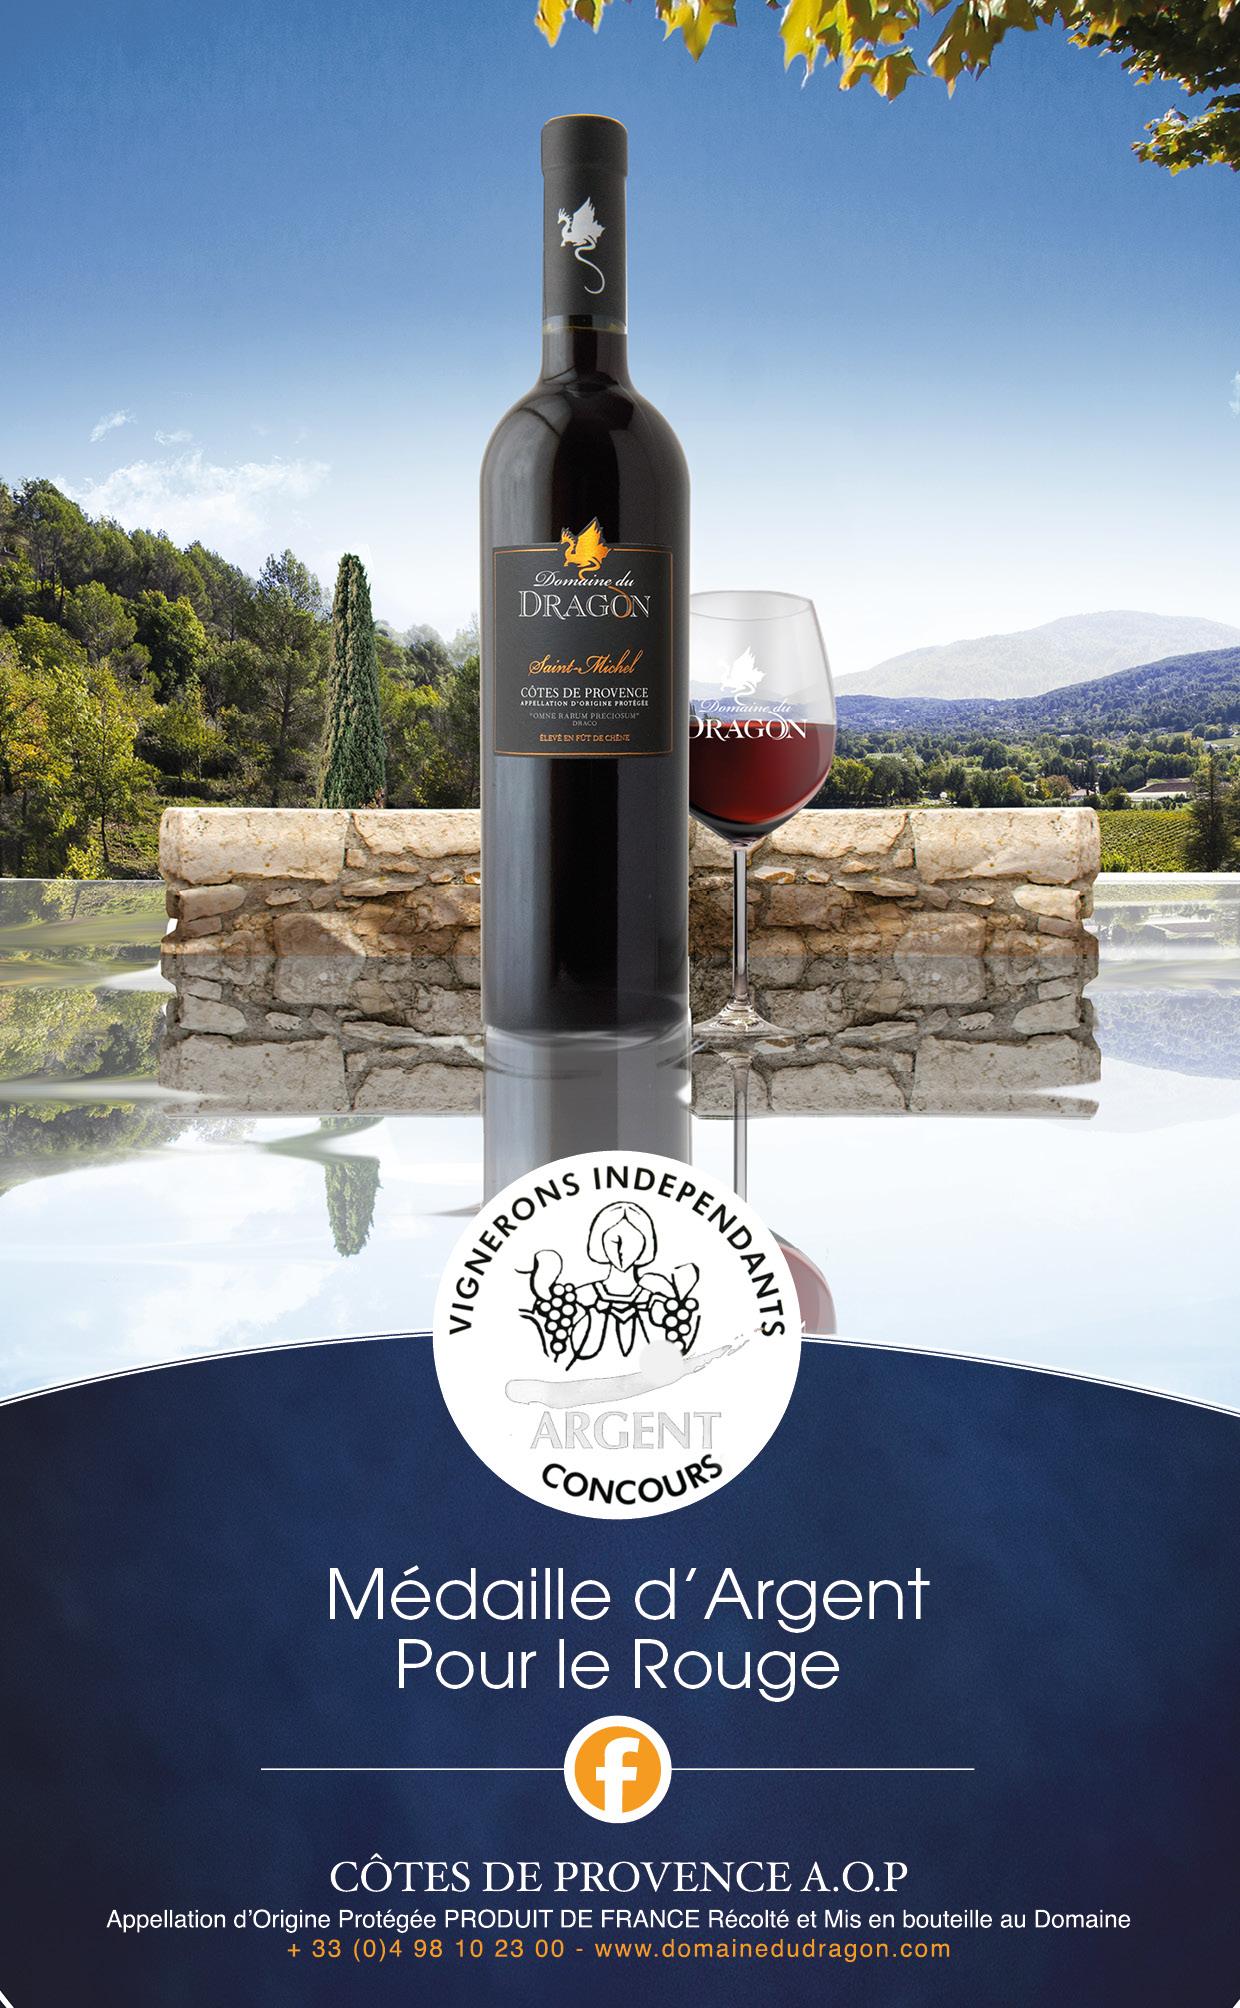 Medaille.recompense.vigneron.independant.2018.vignoble.provencal.Dragon.draguignan3